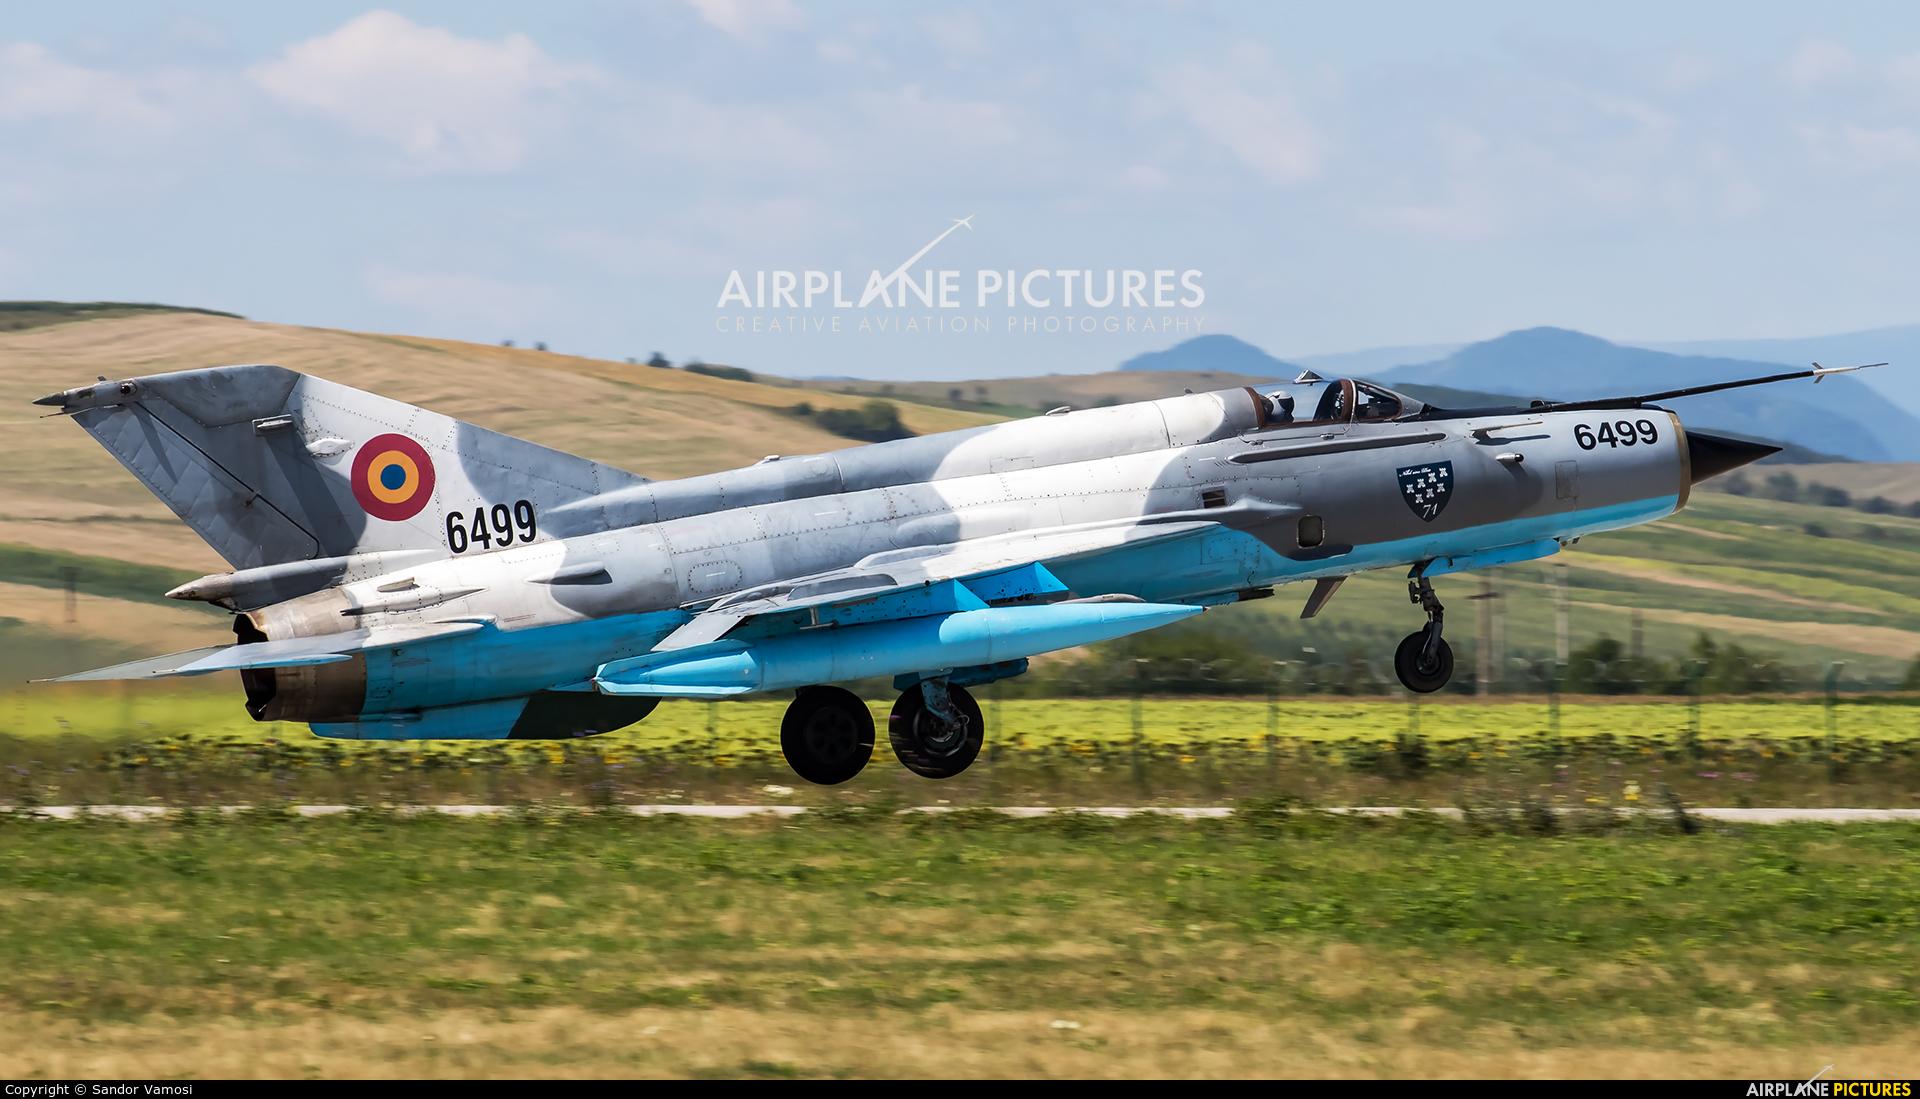 Romania - Air Force 6499 aircraft at Câmpia Turzii